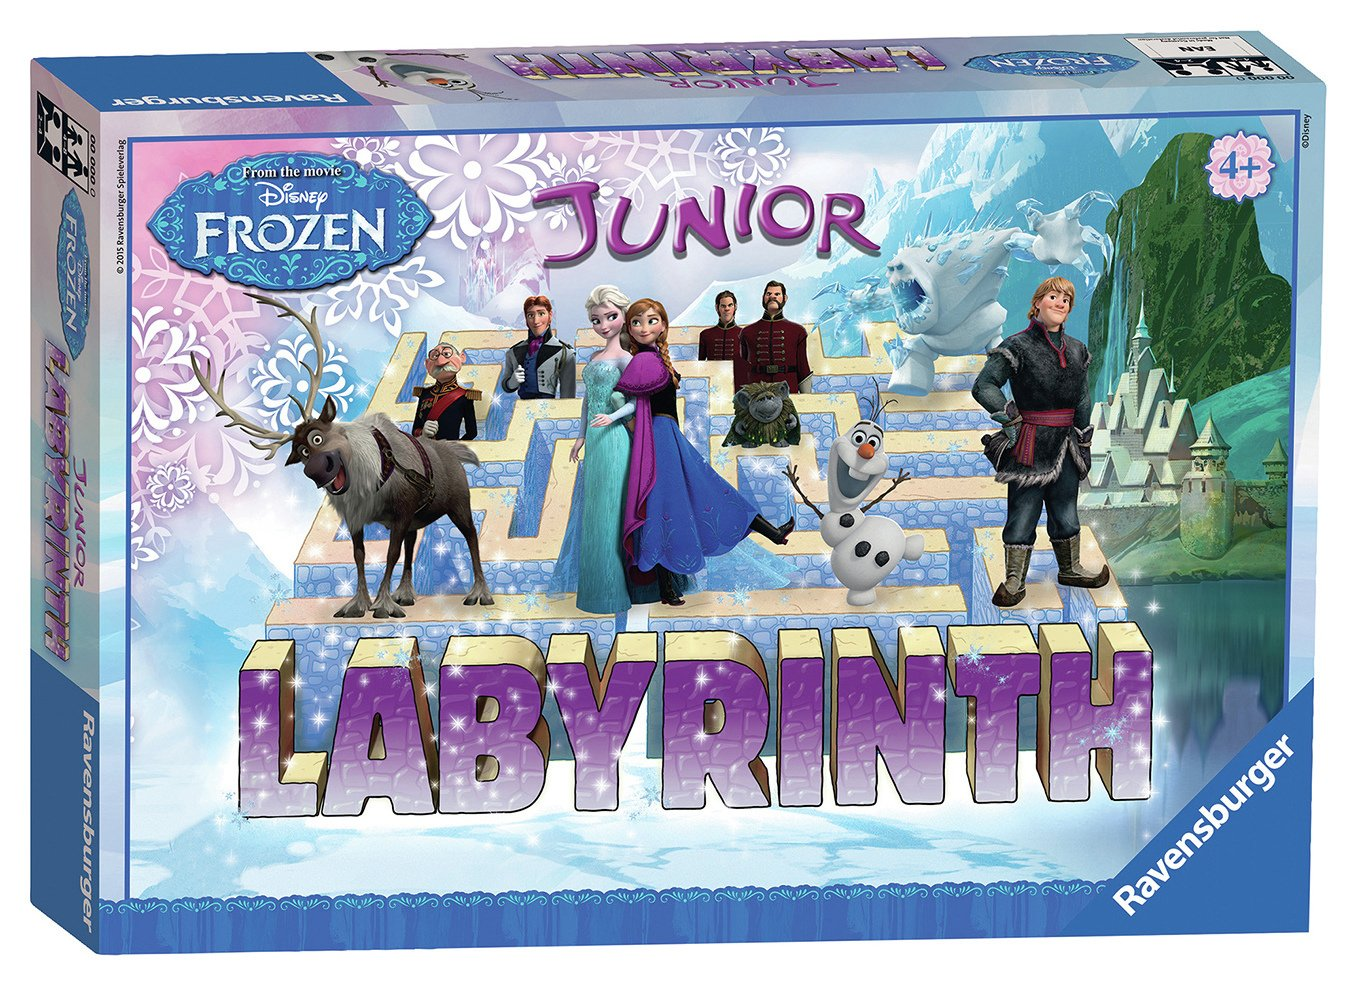 Image of Ravensburger Disney Frozen Labyrinth Junior Game.